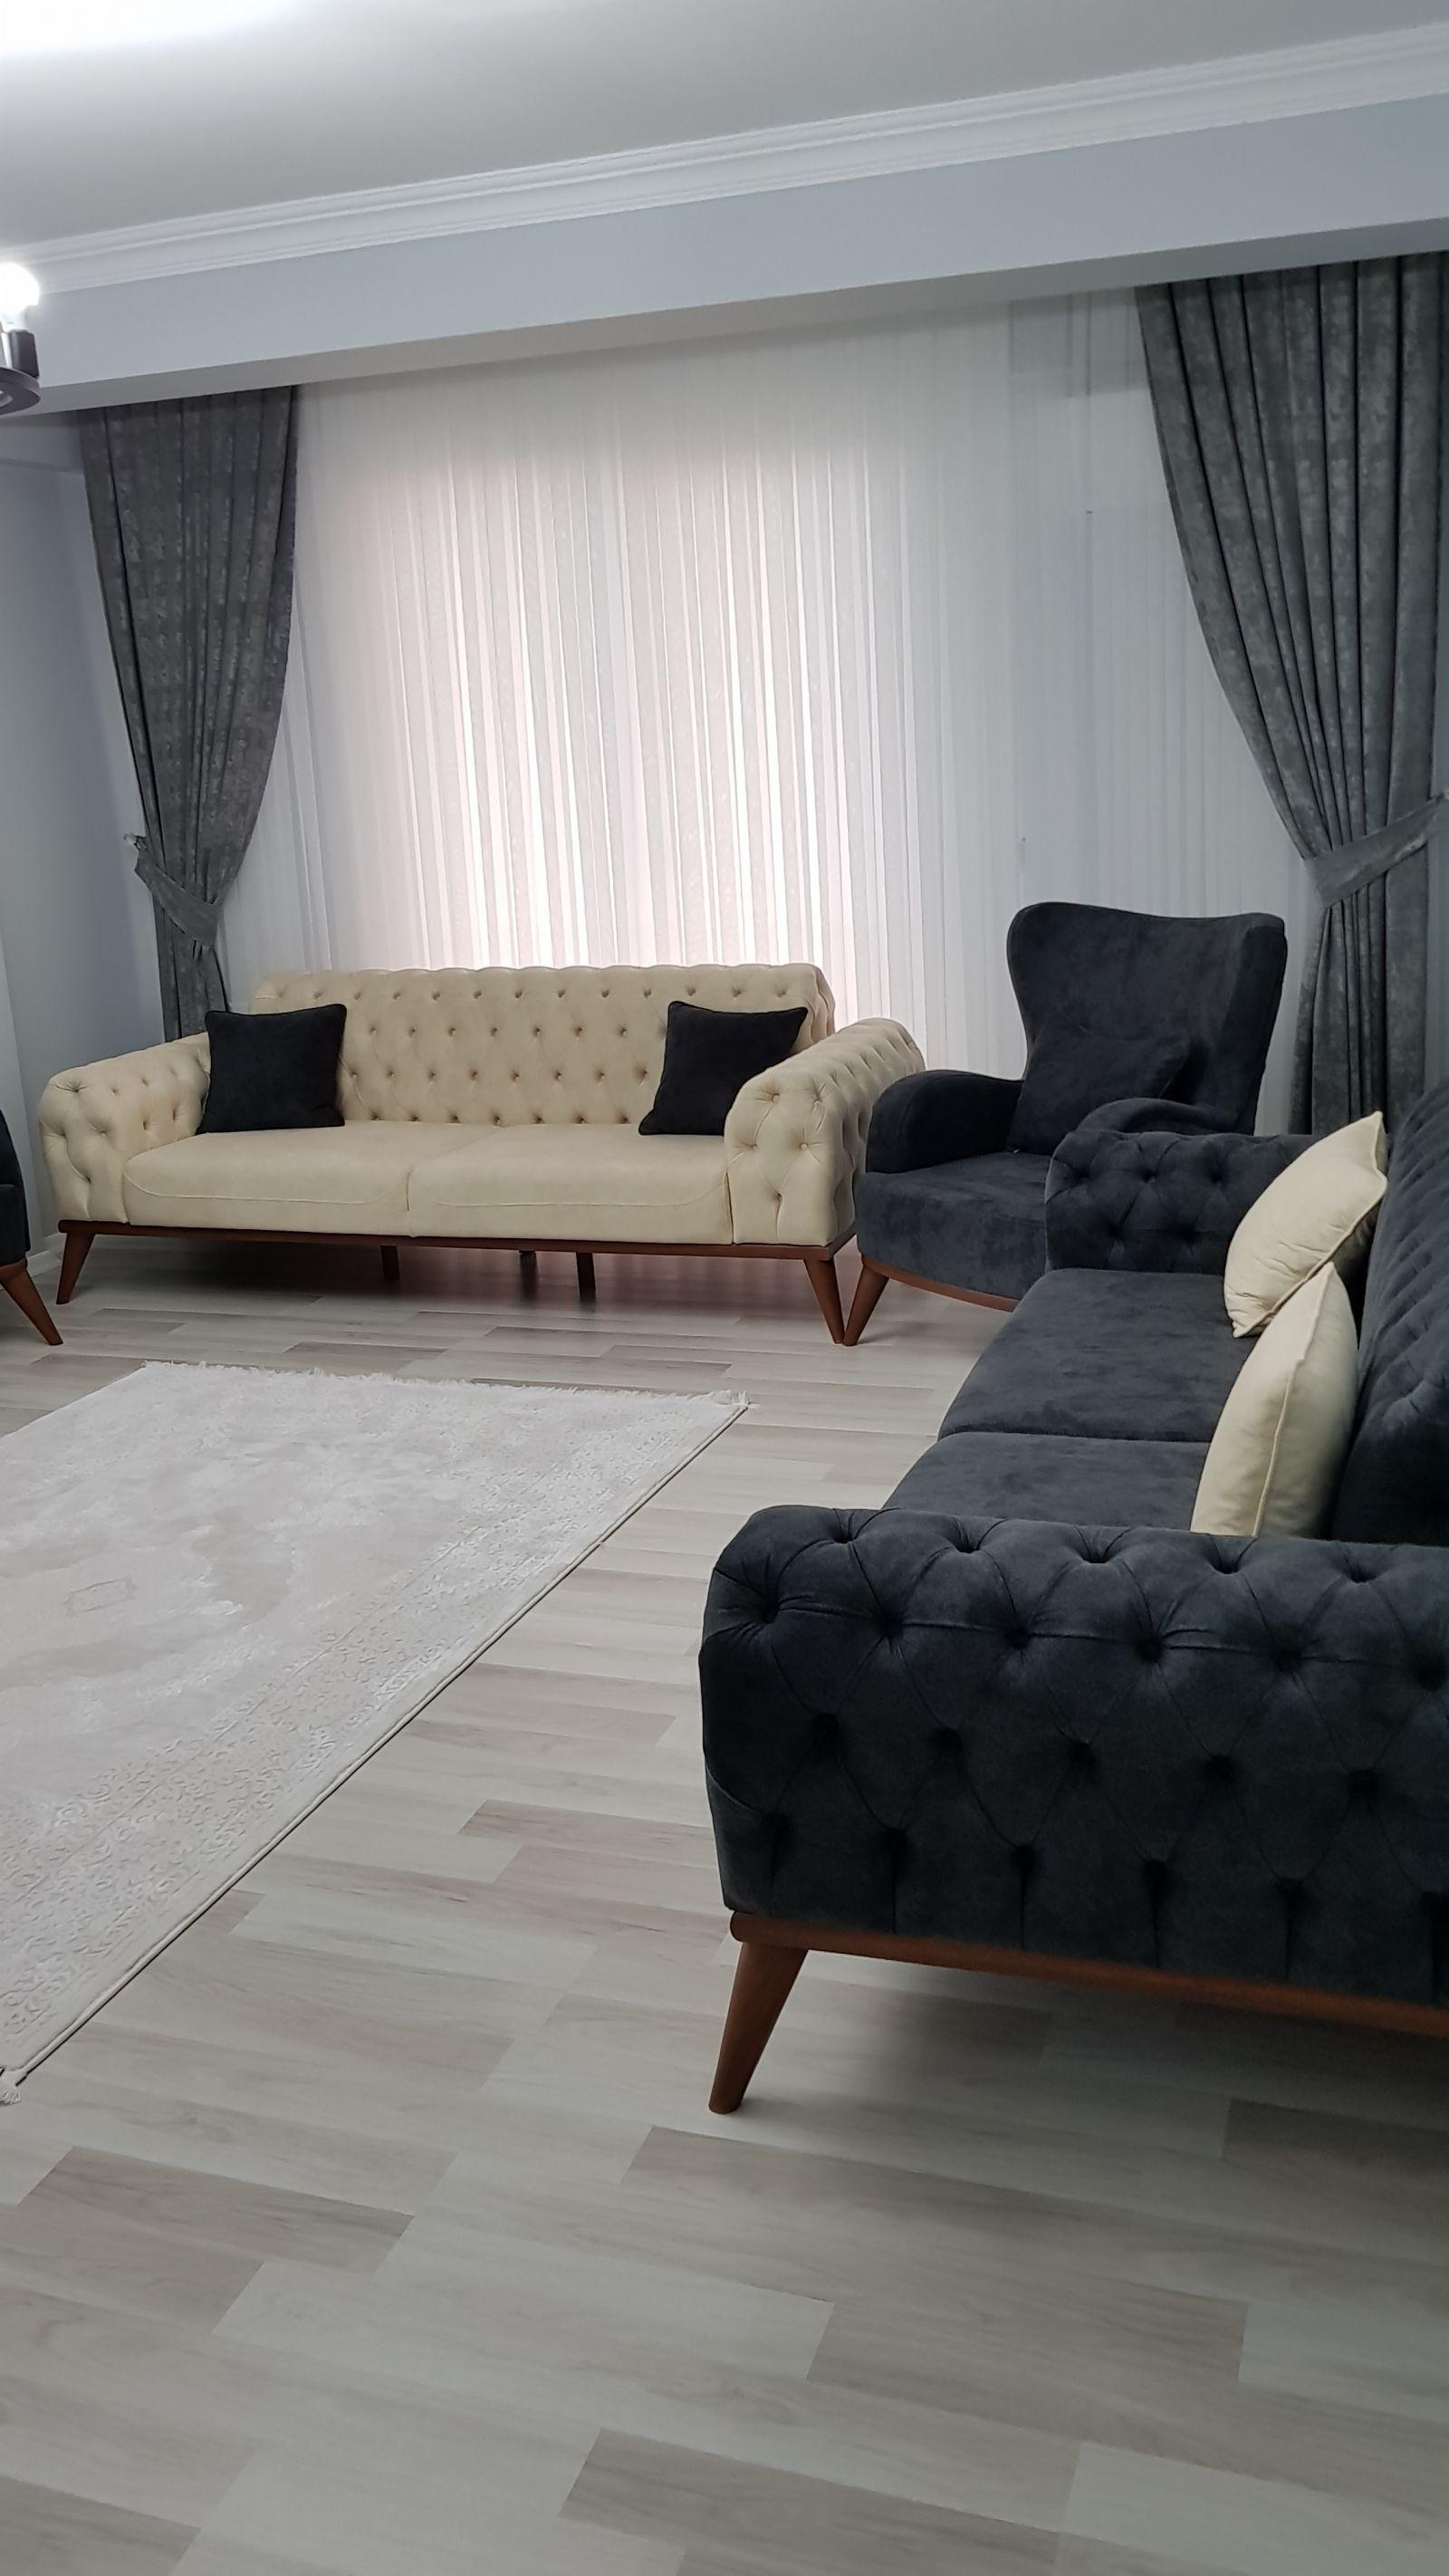 Mein Wohnzimmer Hausbesuch In 2020 Living Room Sofa Design Room Decor Bedroom Sofa Design